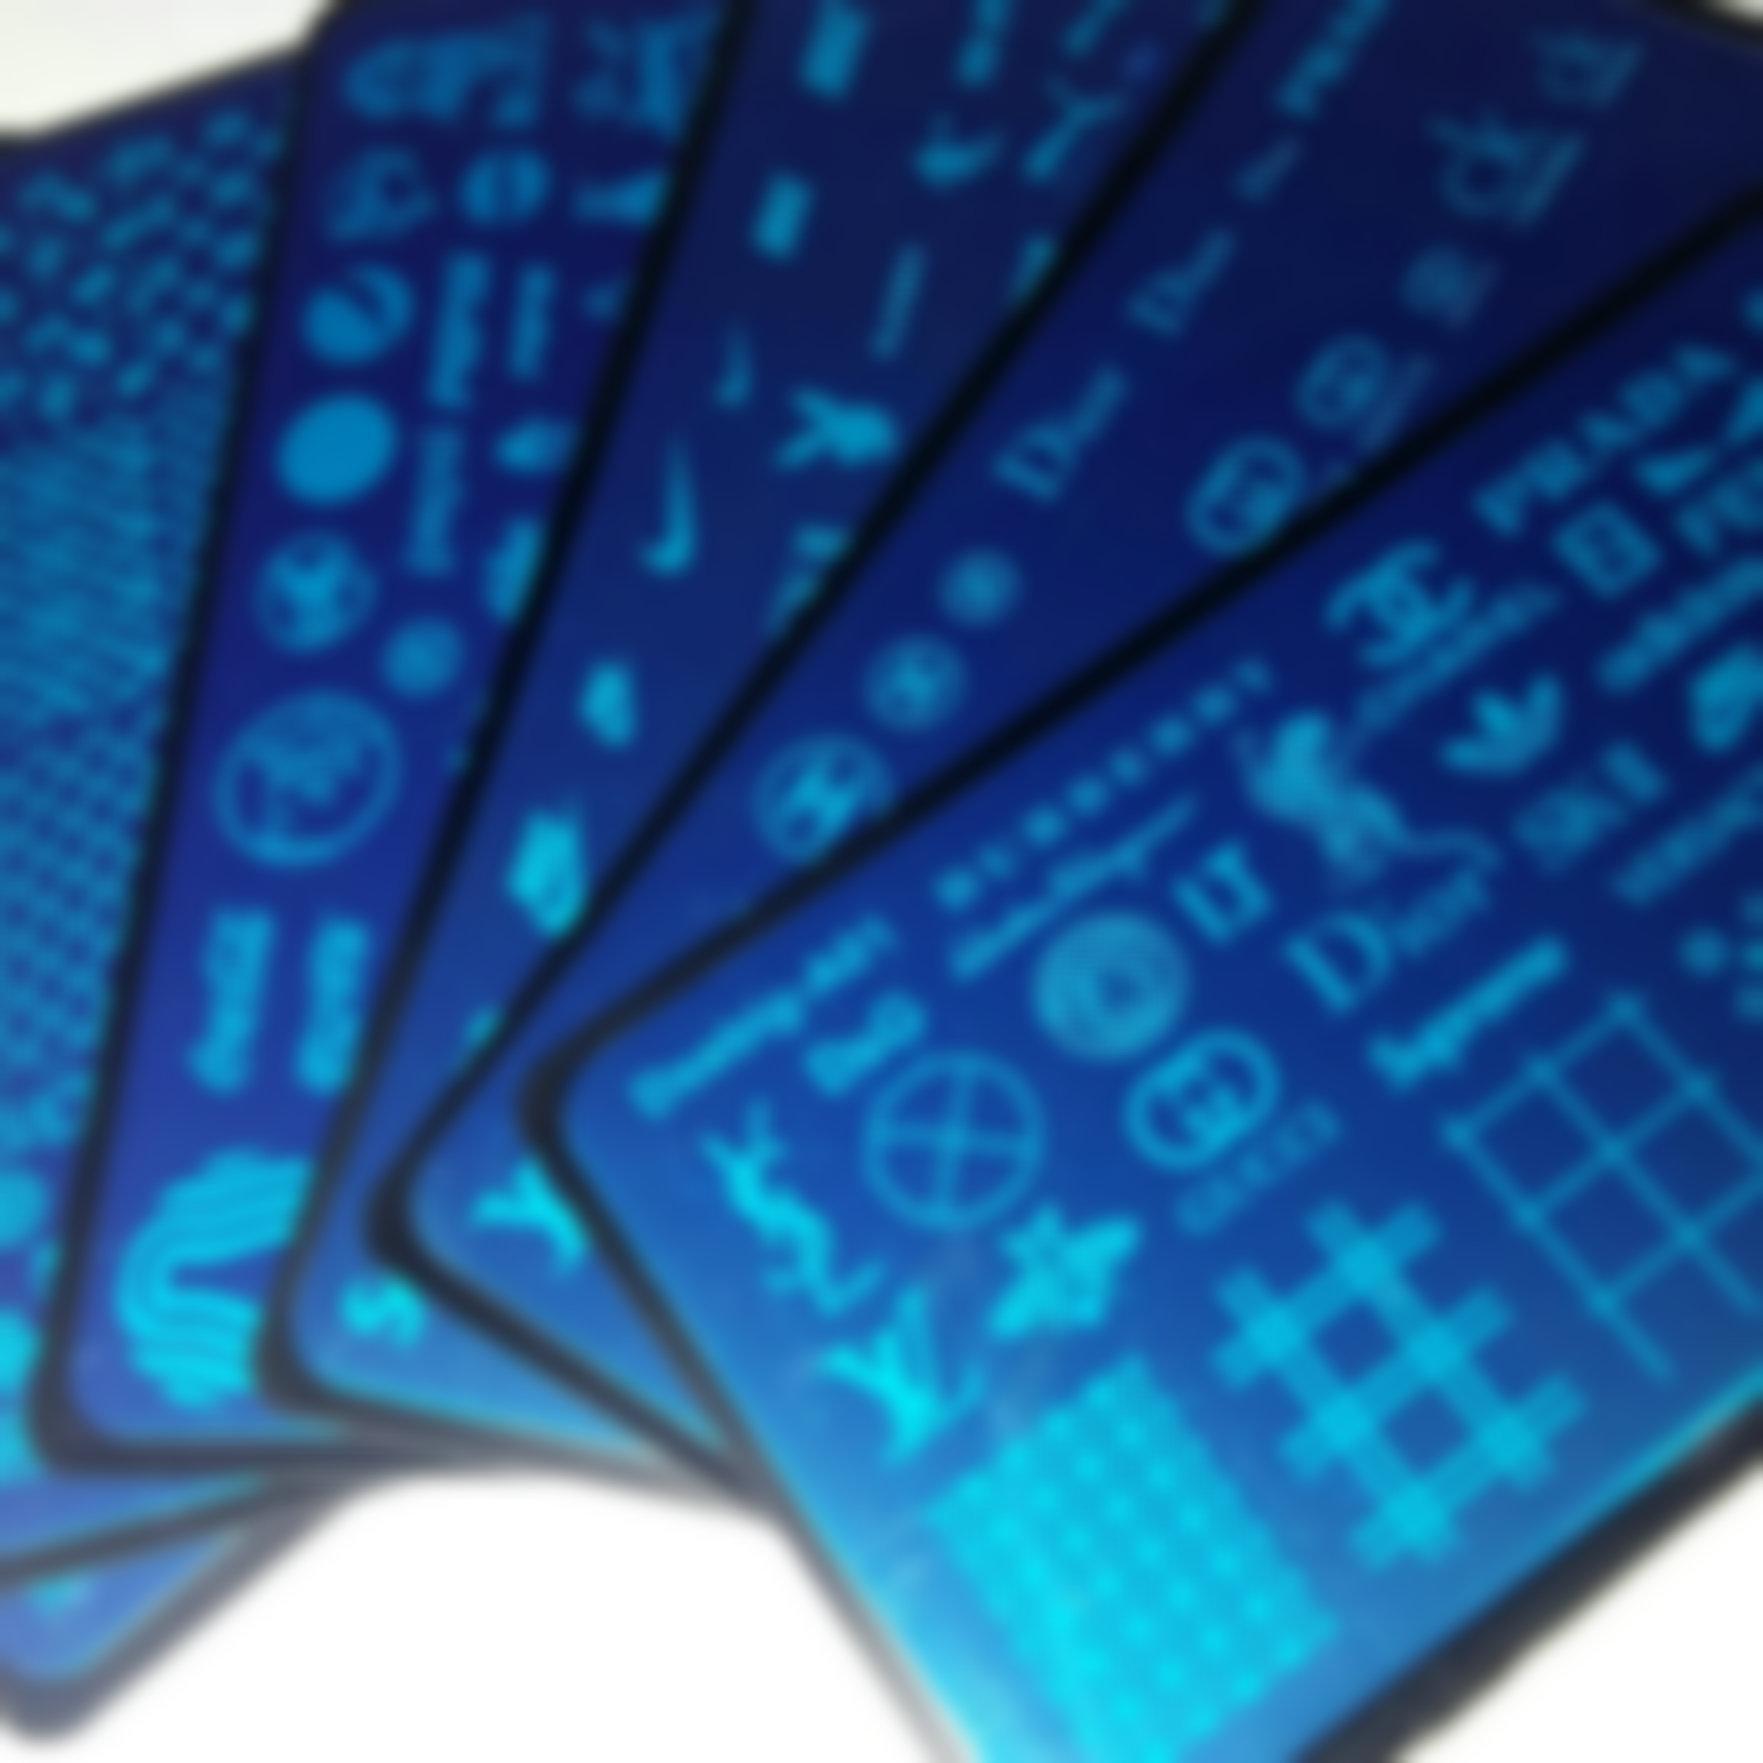 Neue 6 stücke Marke Logo Design Nail Art Stamping Platte (mit Plastikblatt) Stempel Big XL Designs Image Platten Transfer Polish Druckvorlage